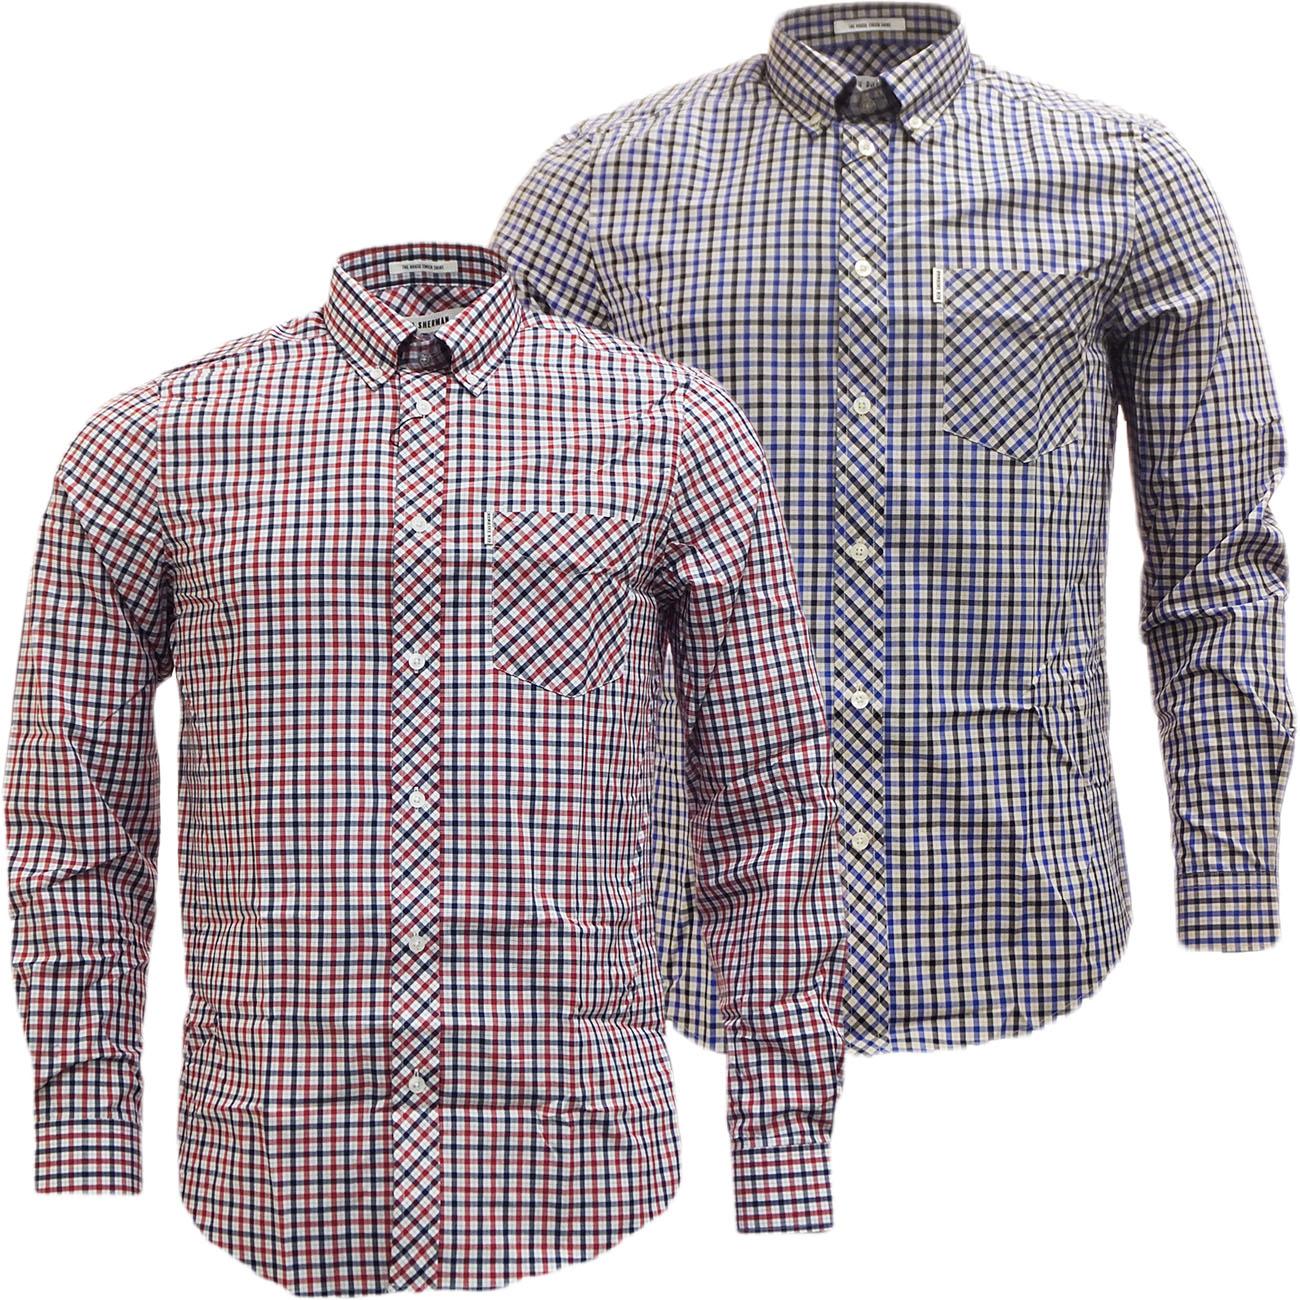 ben sherman shirt ebay